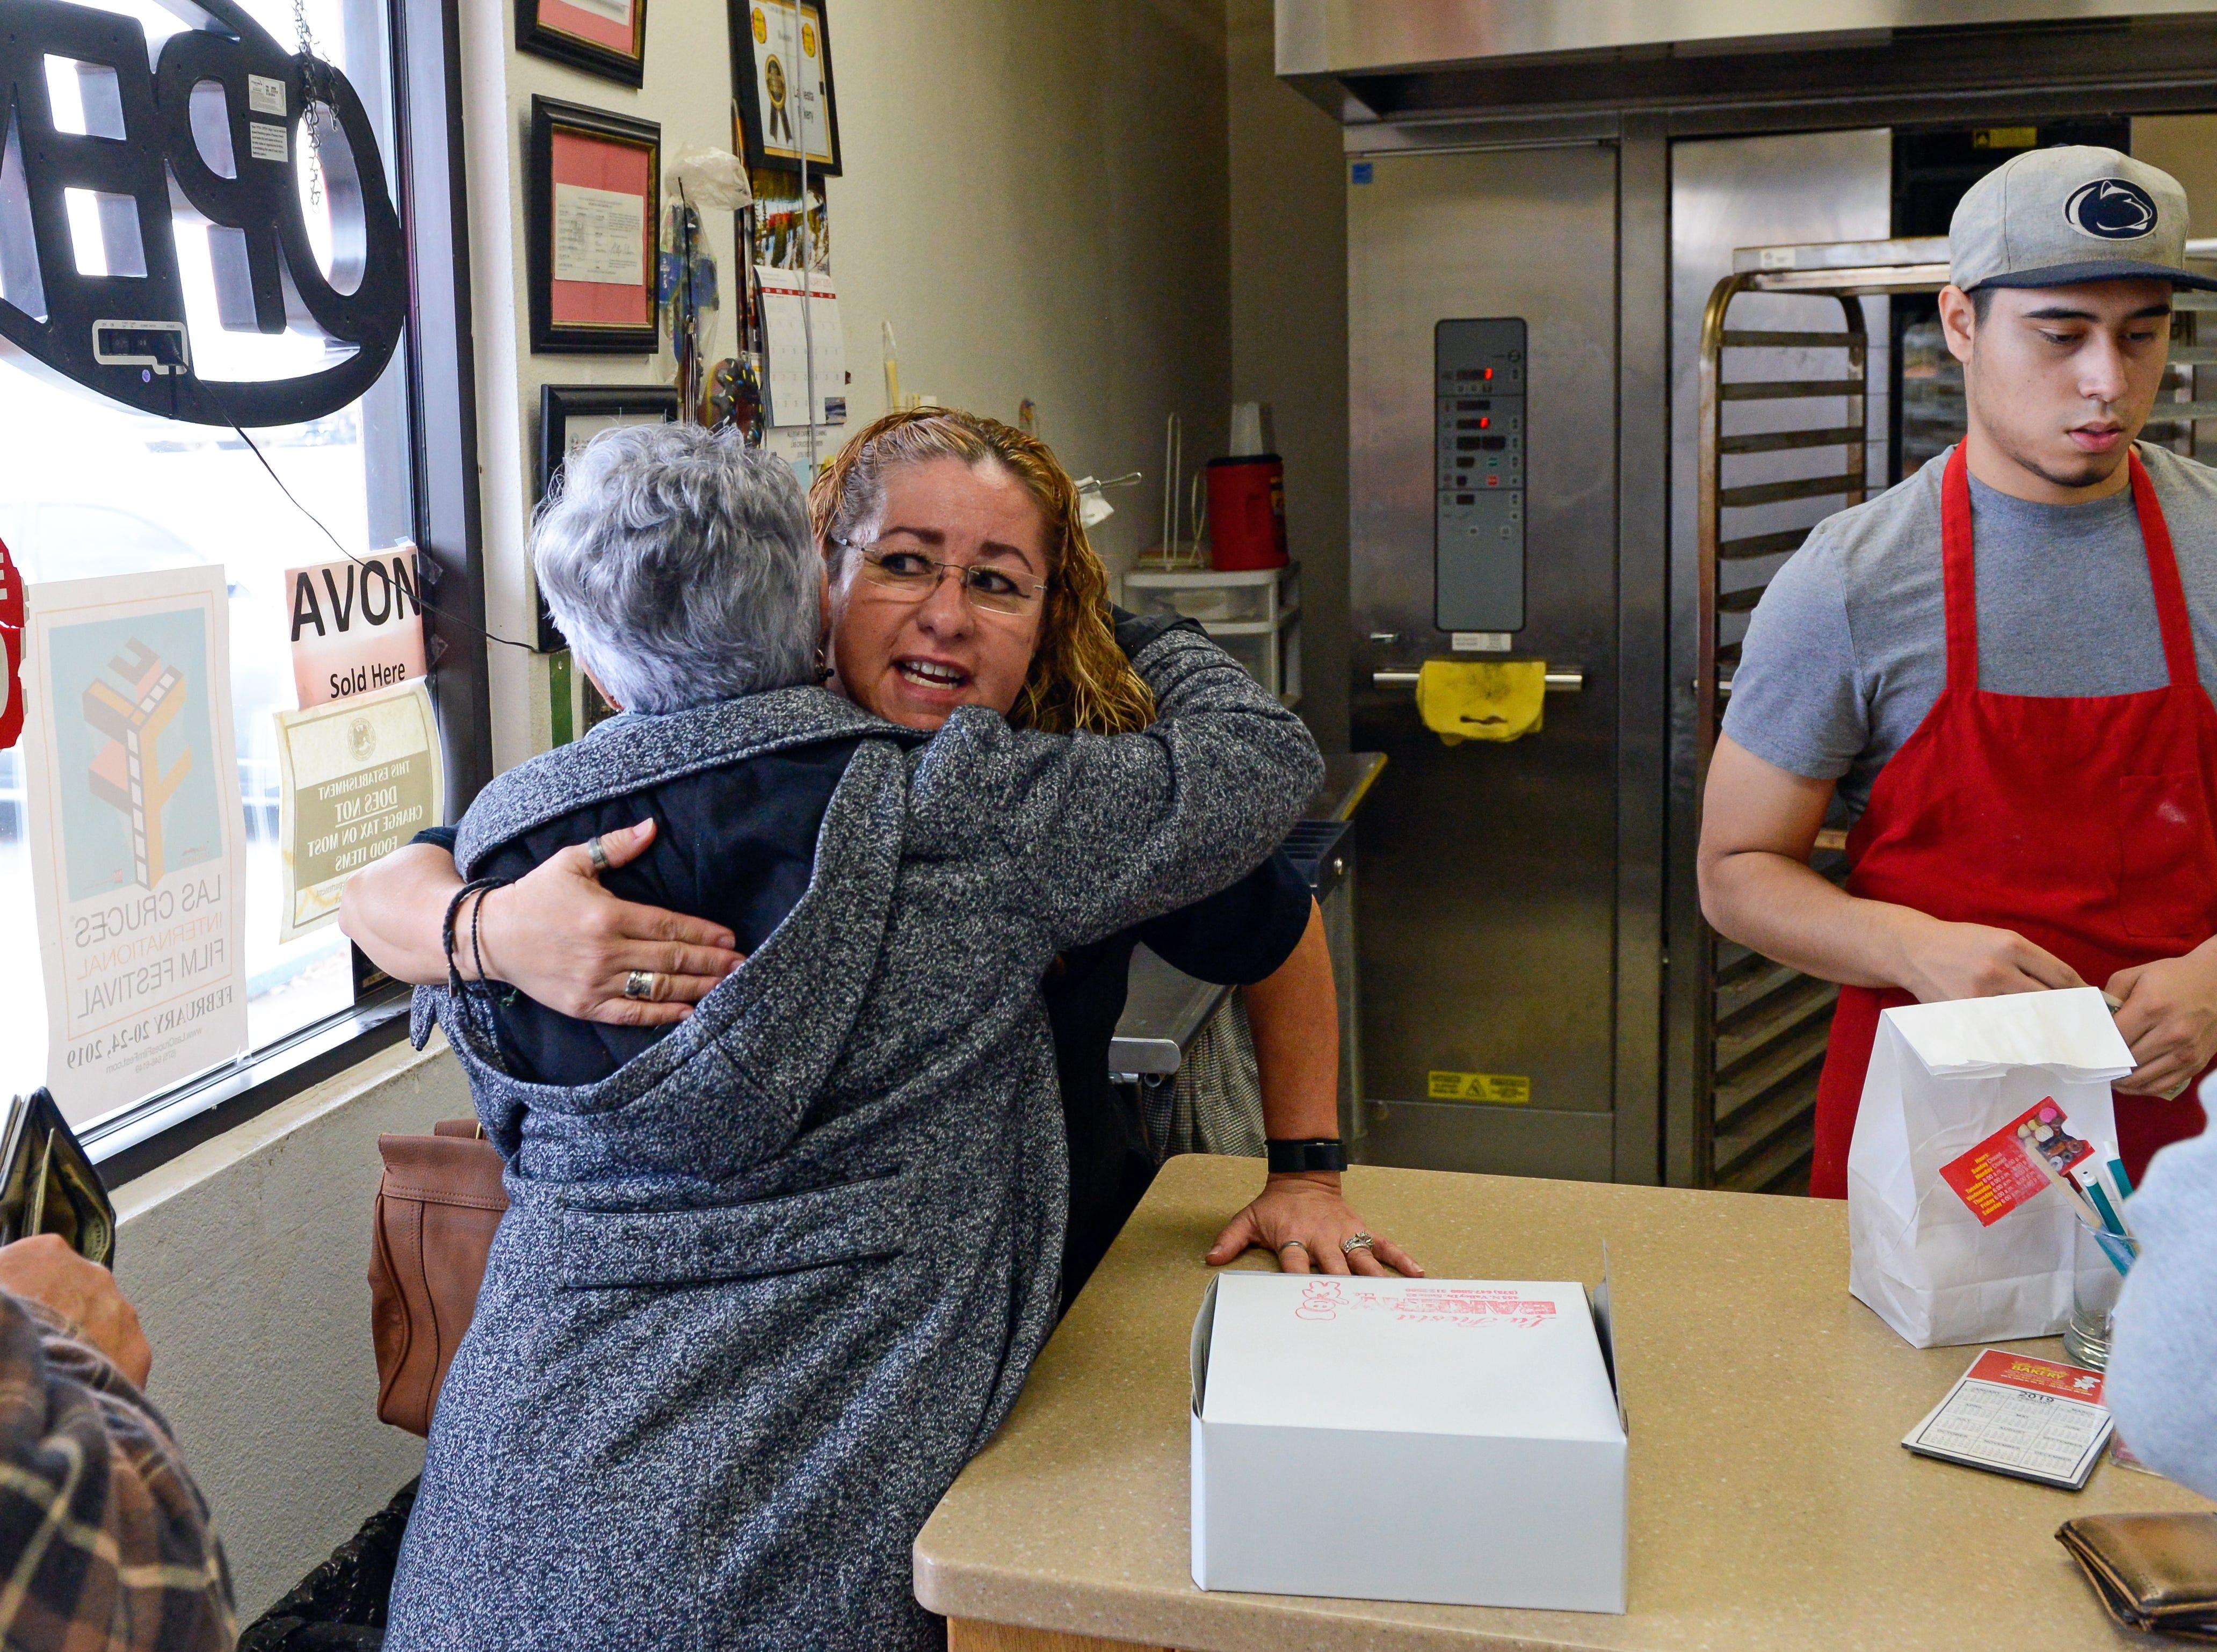 Gina Ortega, who owns La Fiesta Bakery with her husband Ray, hugs a customer at the bakery on January 10, 2019.